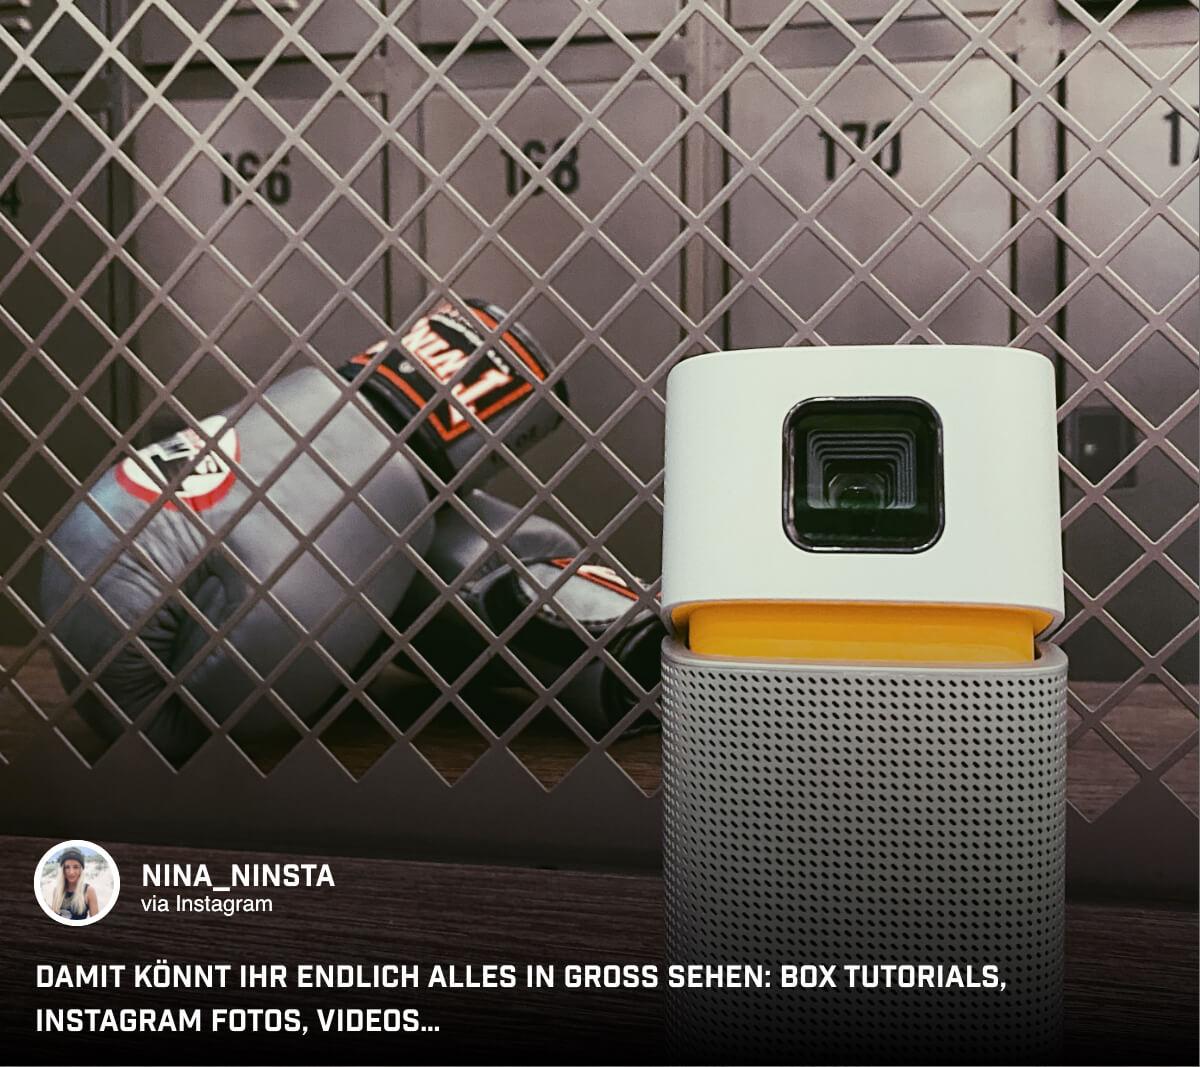 Der portable Mini-Beamer kommt bei @nina_ninsta sogar mit zum Sport.